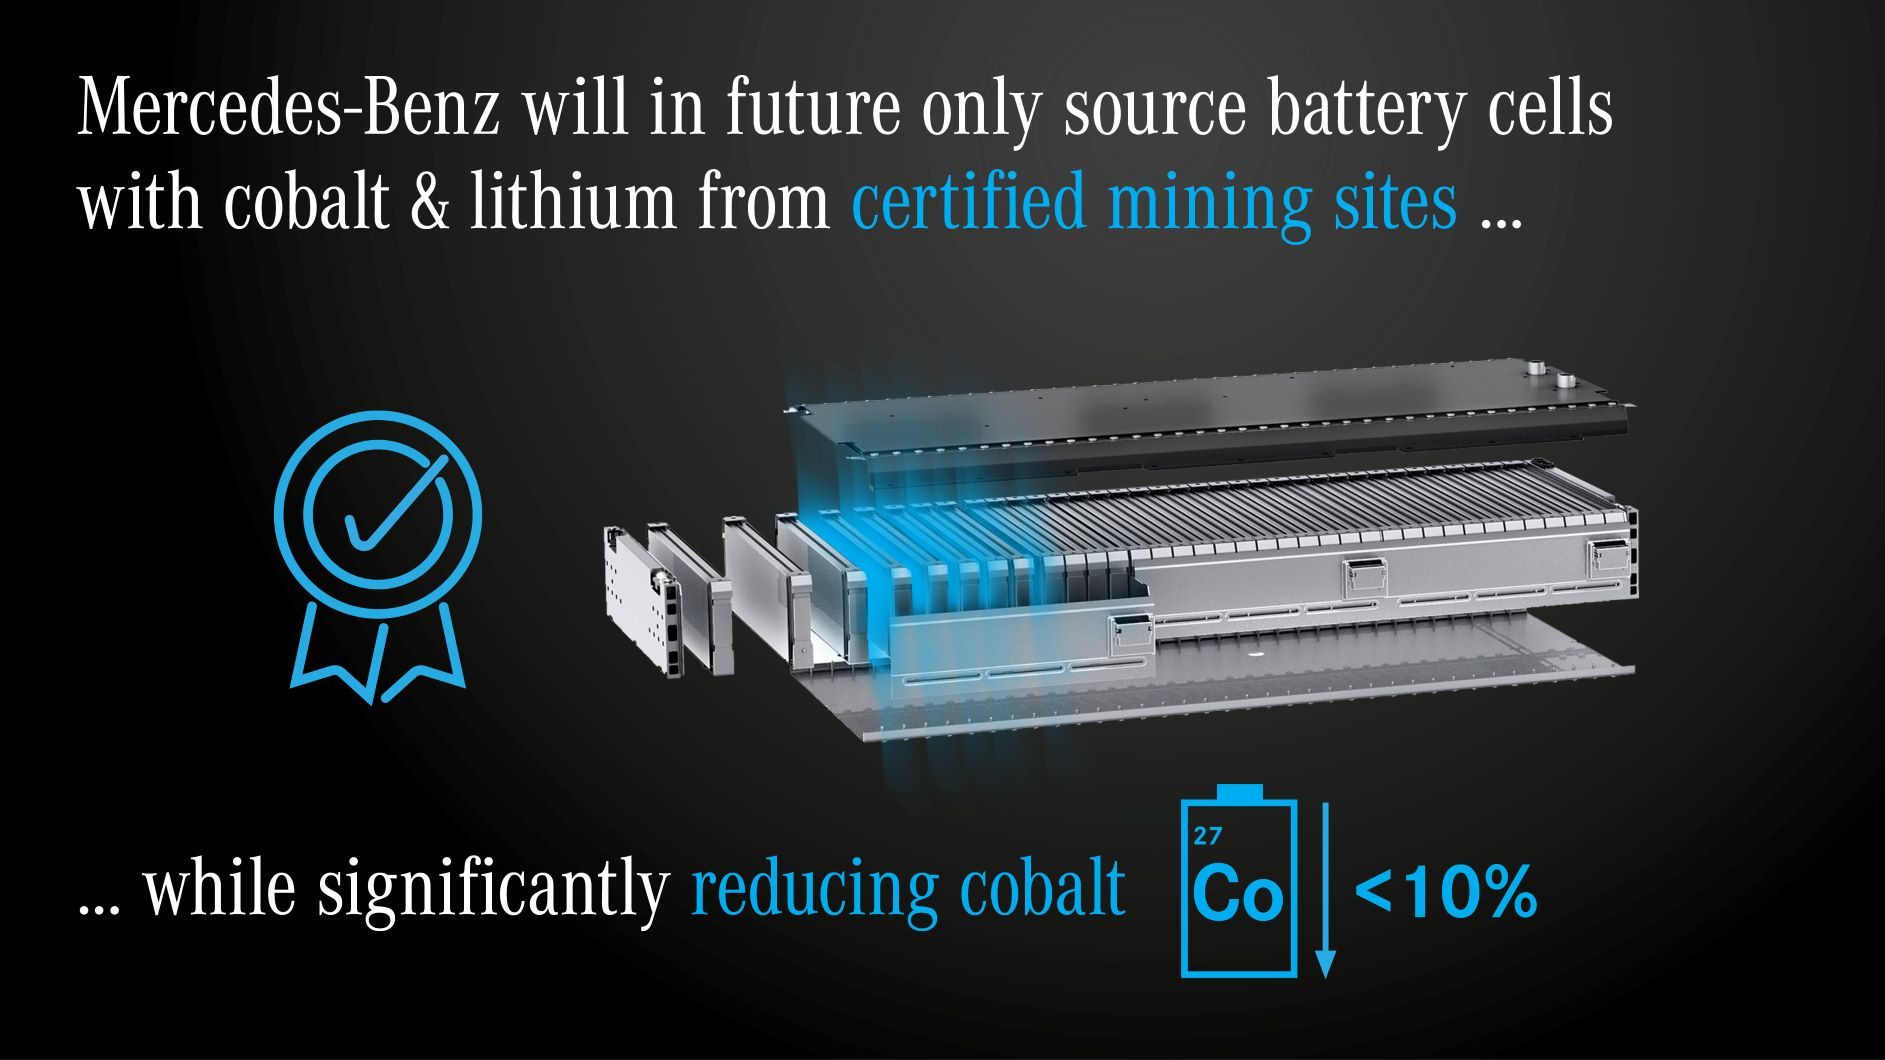 Mercedes cobalto litio minerari certificati